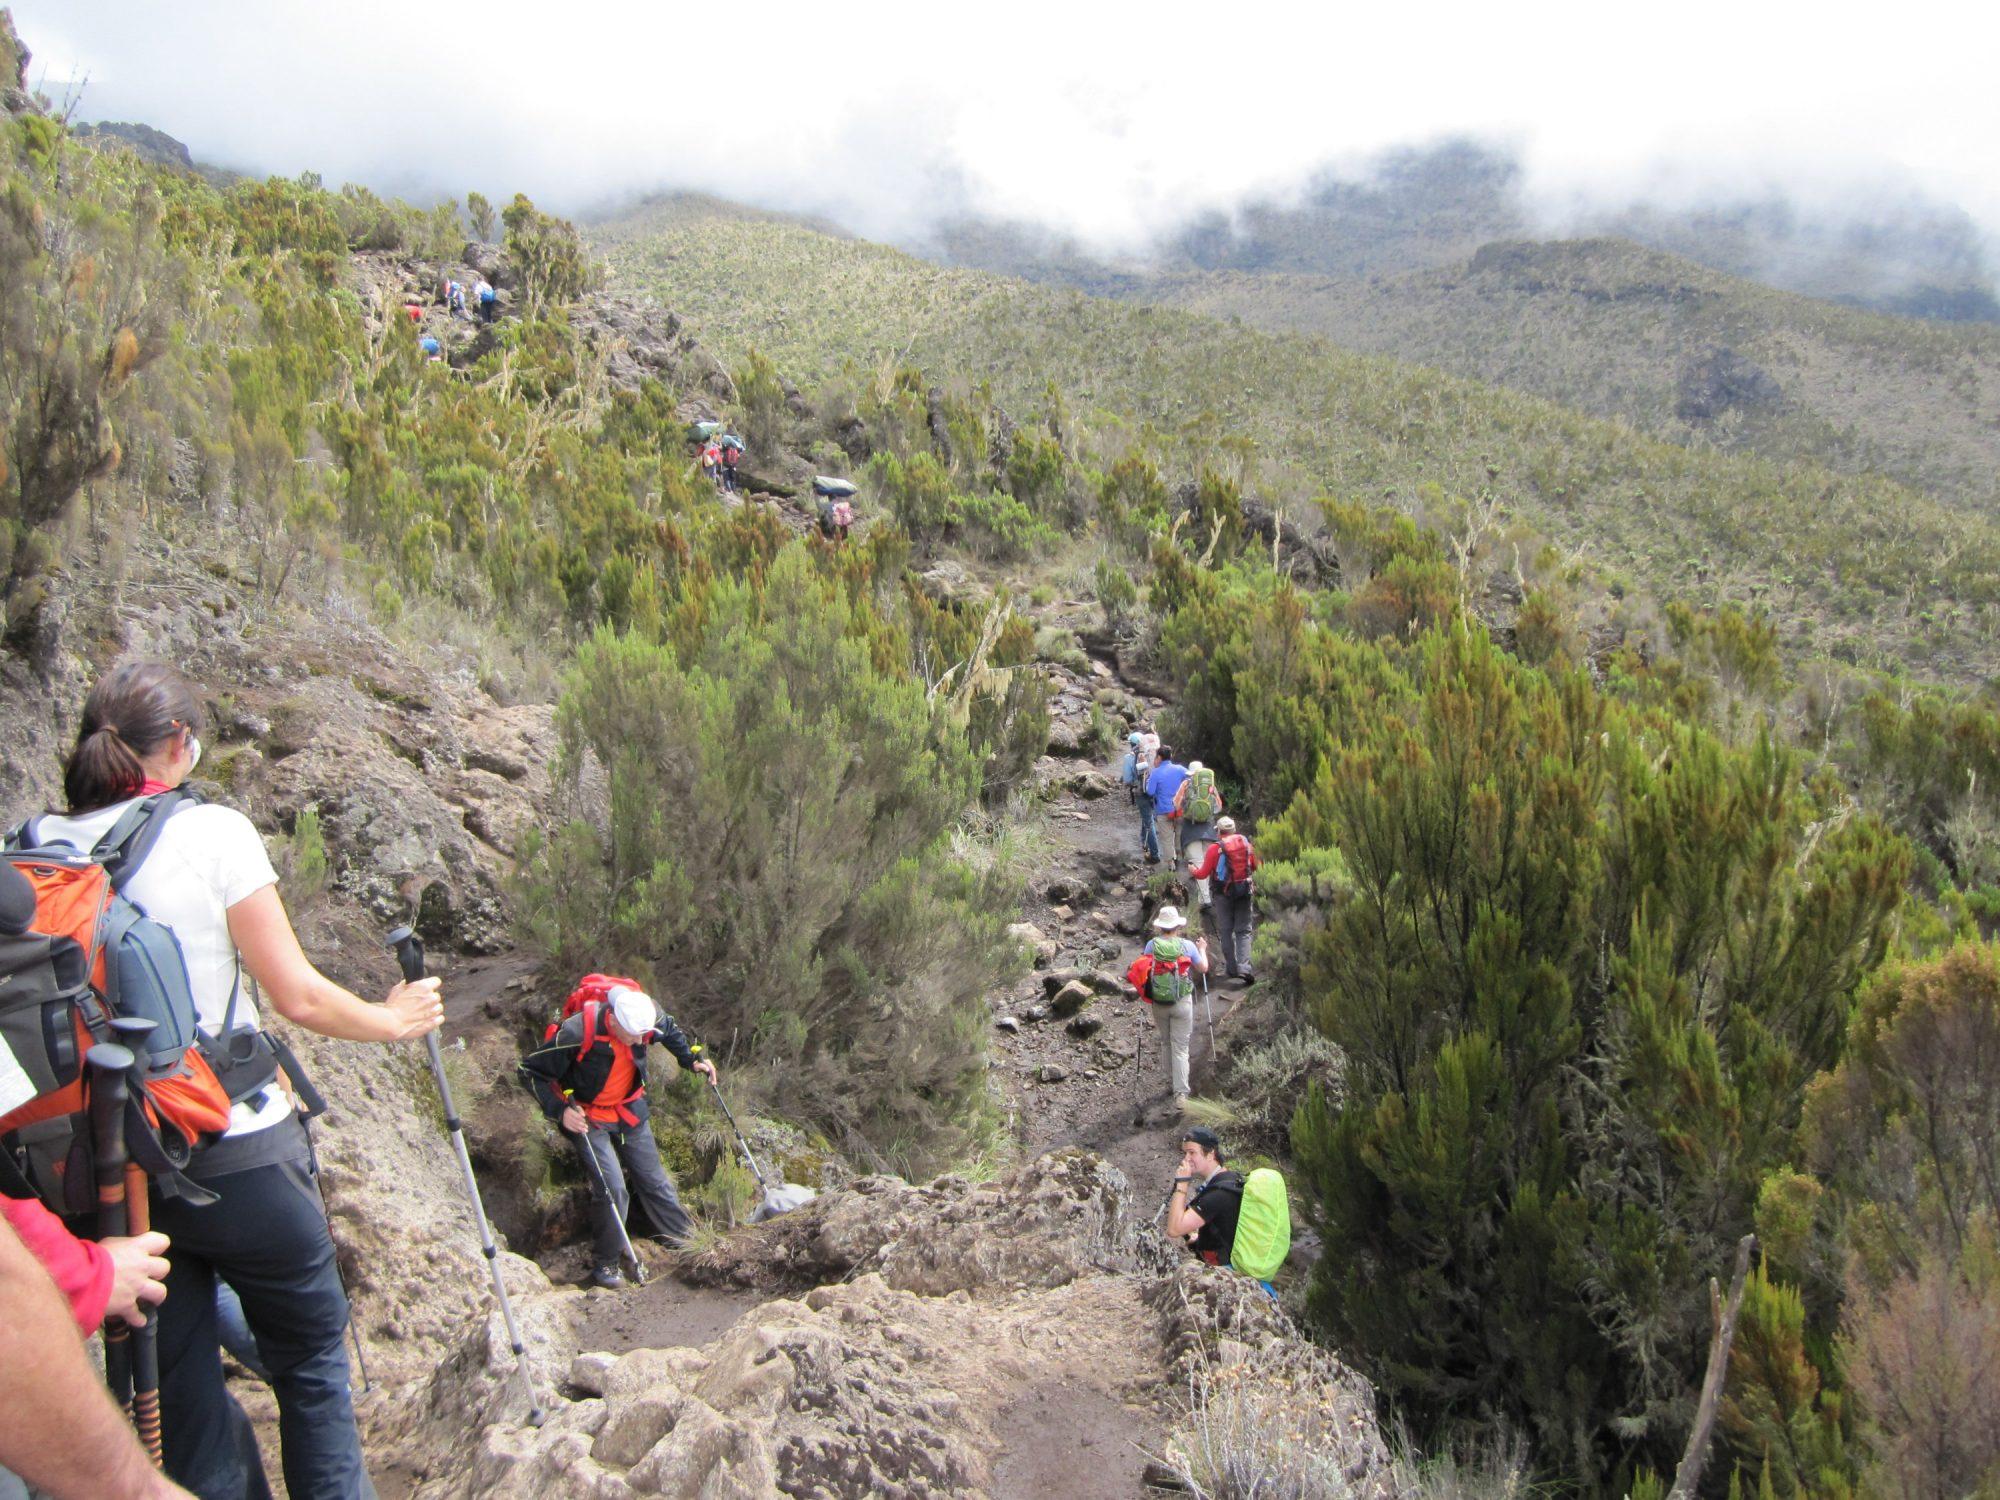 Heidelandschaft Kilimandscharo, Kilimandscharo besteigen, Tansania, Afrika, Kilimandscharo Tour, Erfahrungsbericht, Machame Route